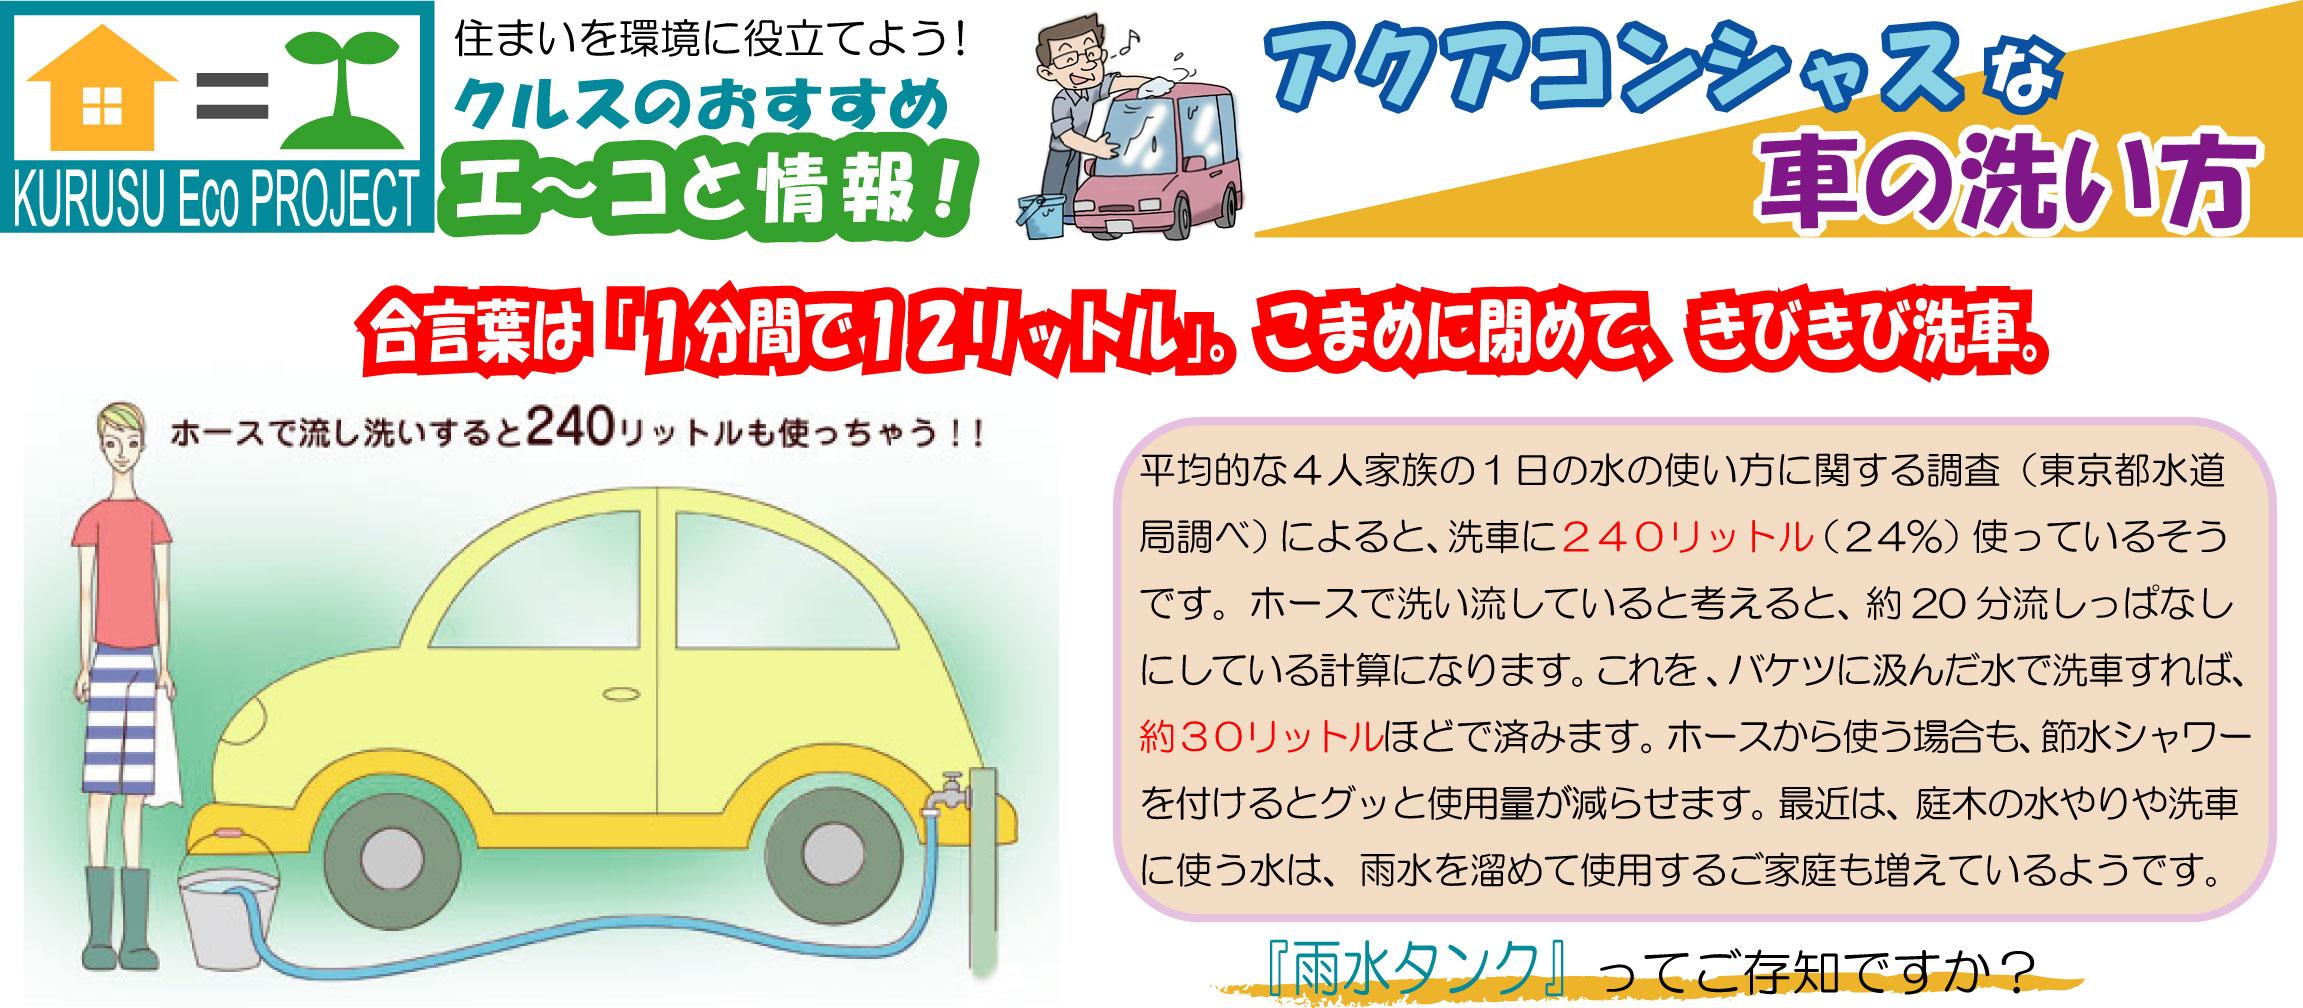 KuraSi-natu-sin61-10.jpg